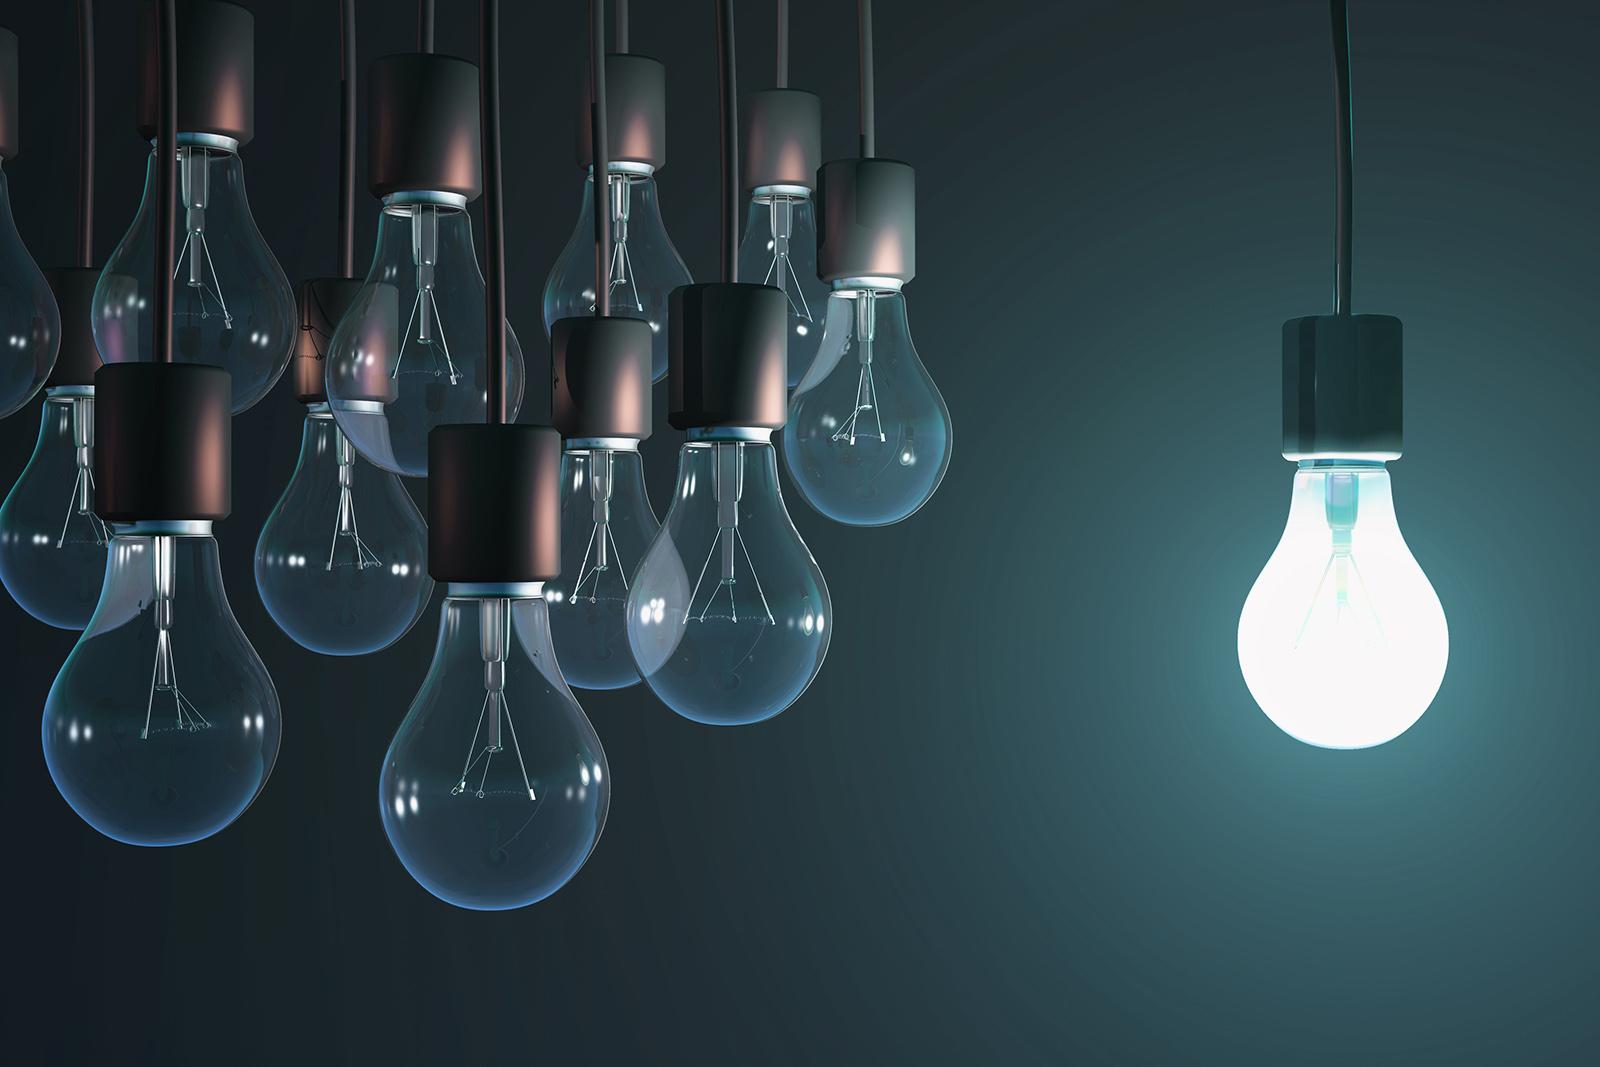 one lighted light bulb among the gray